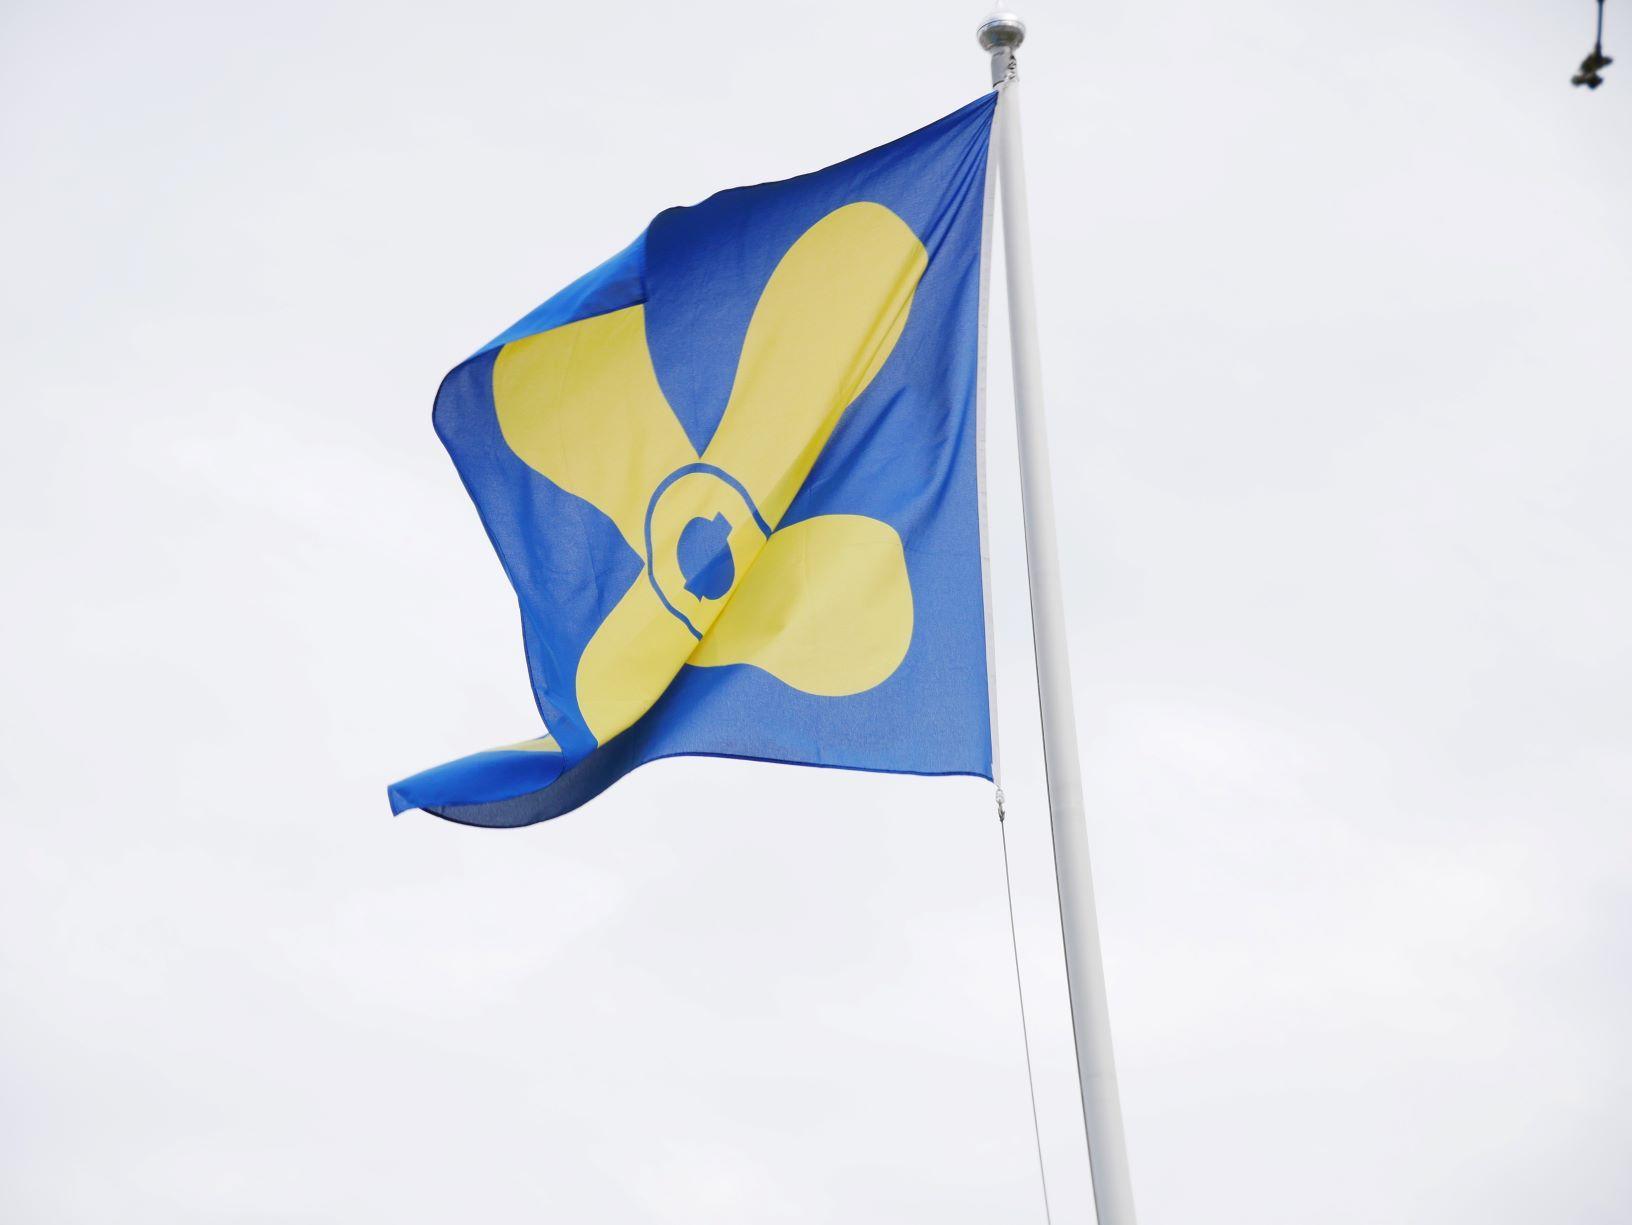 Kimitoös flagga.